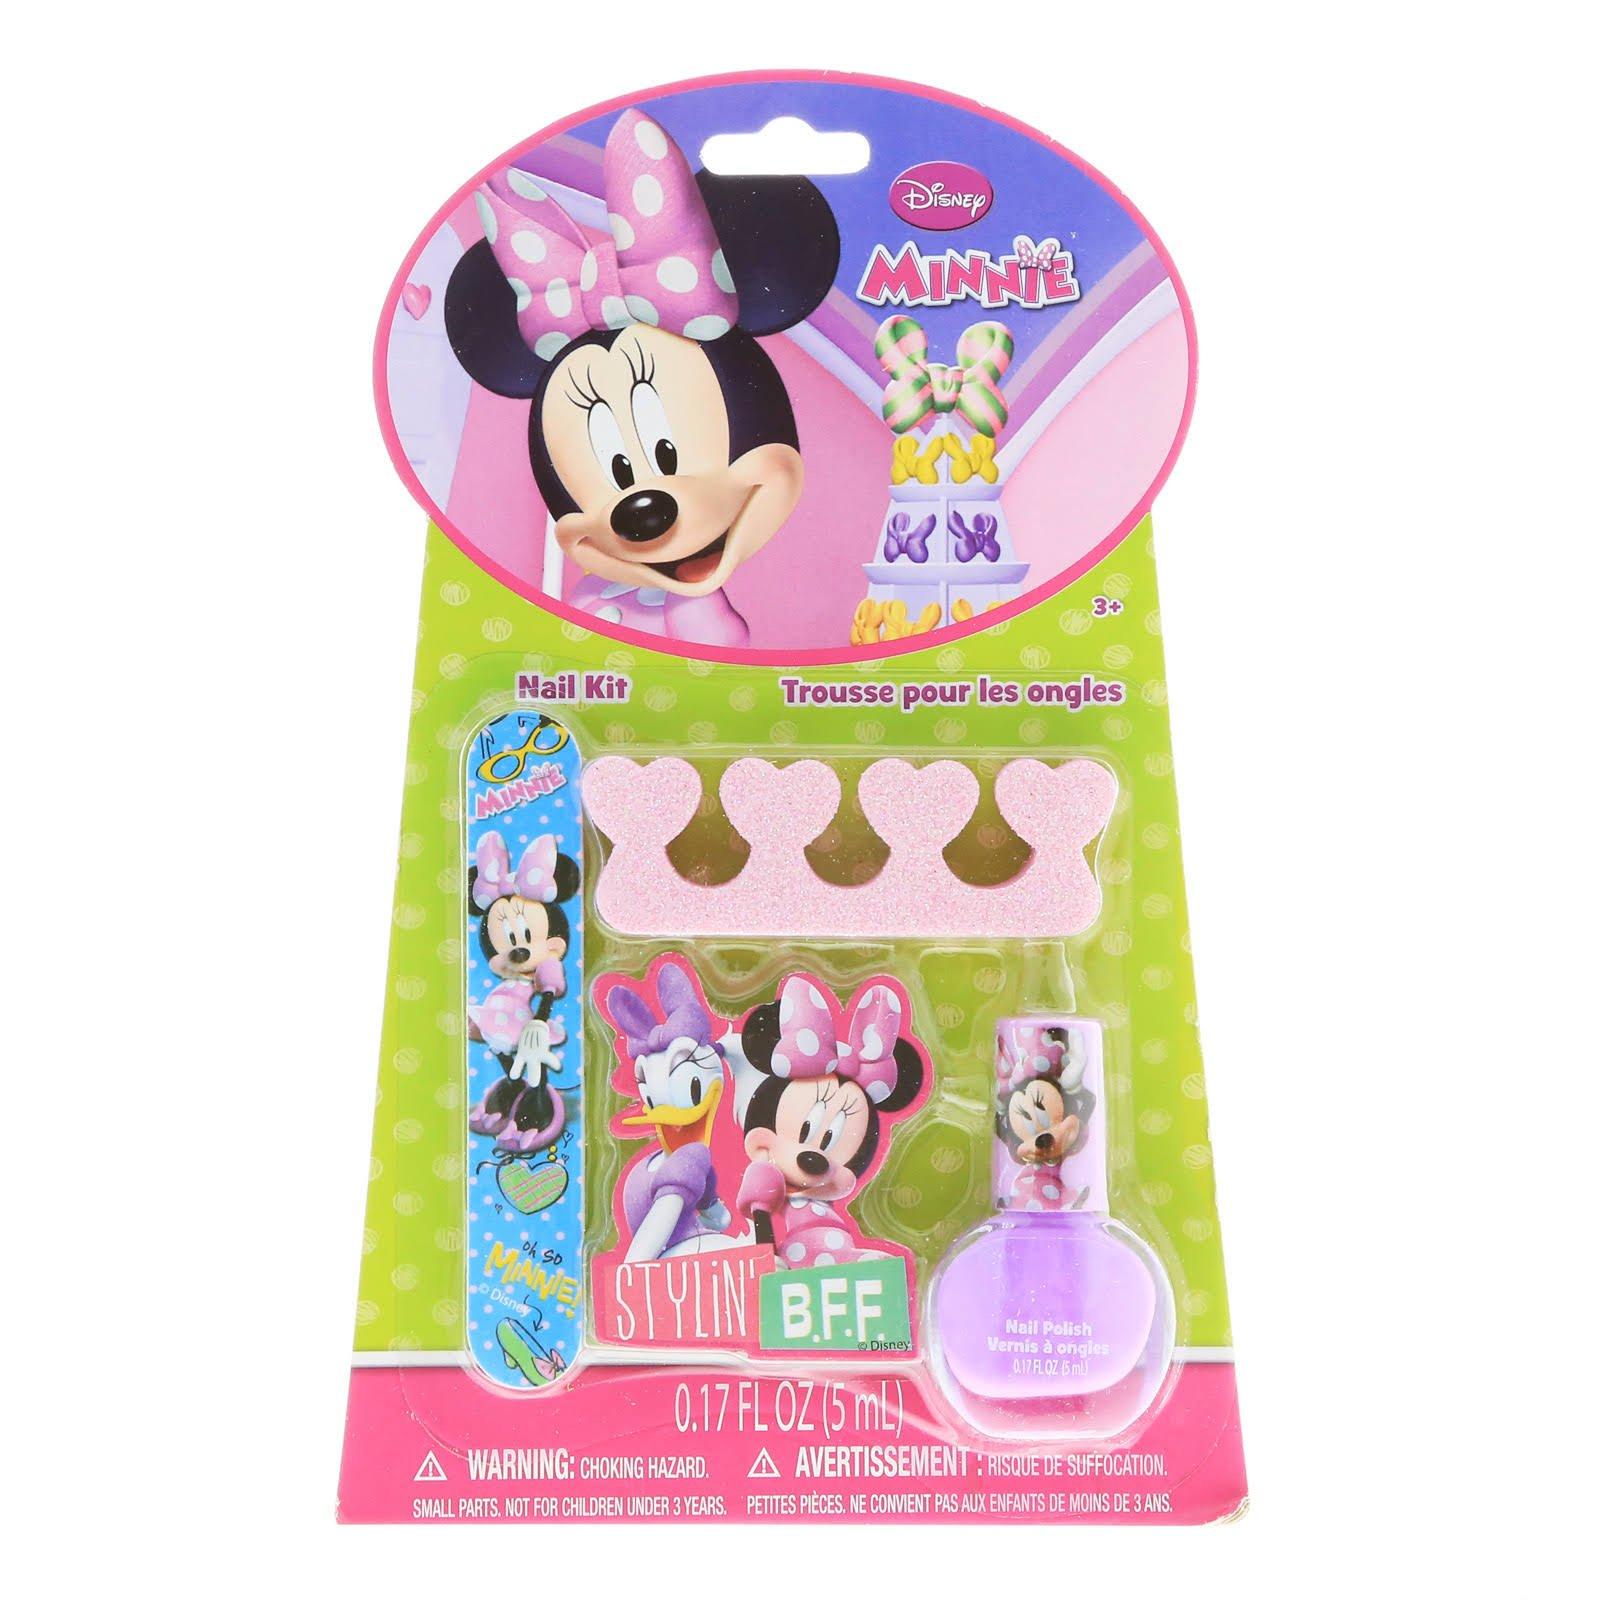 Minnie Mouse Complete Nail Kit 4 Piece Set